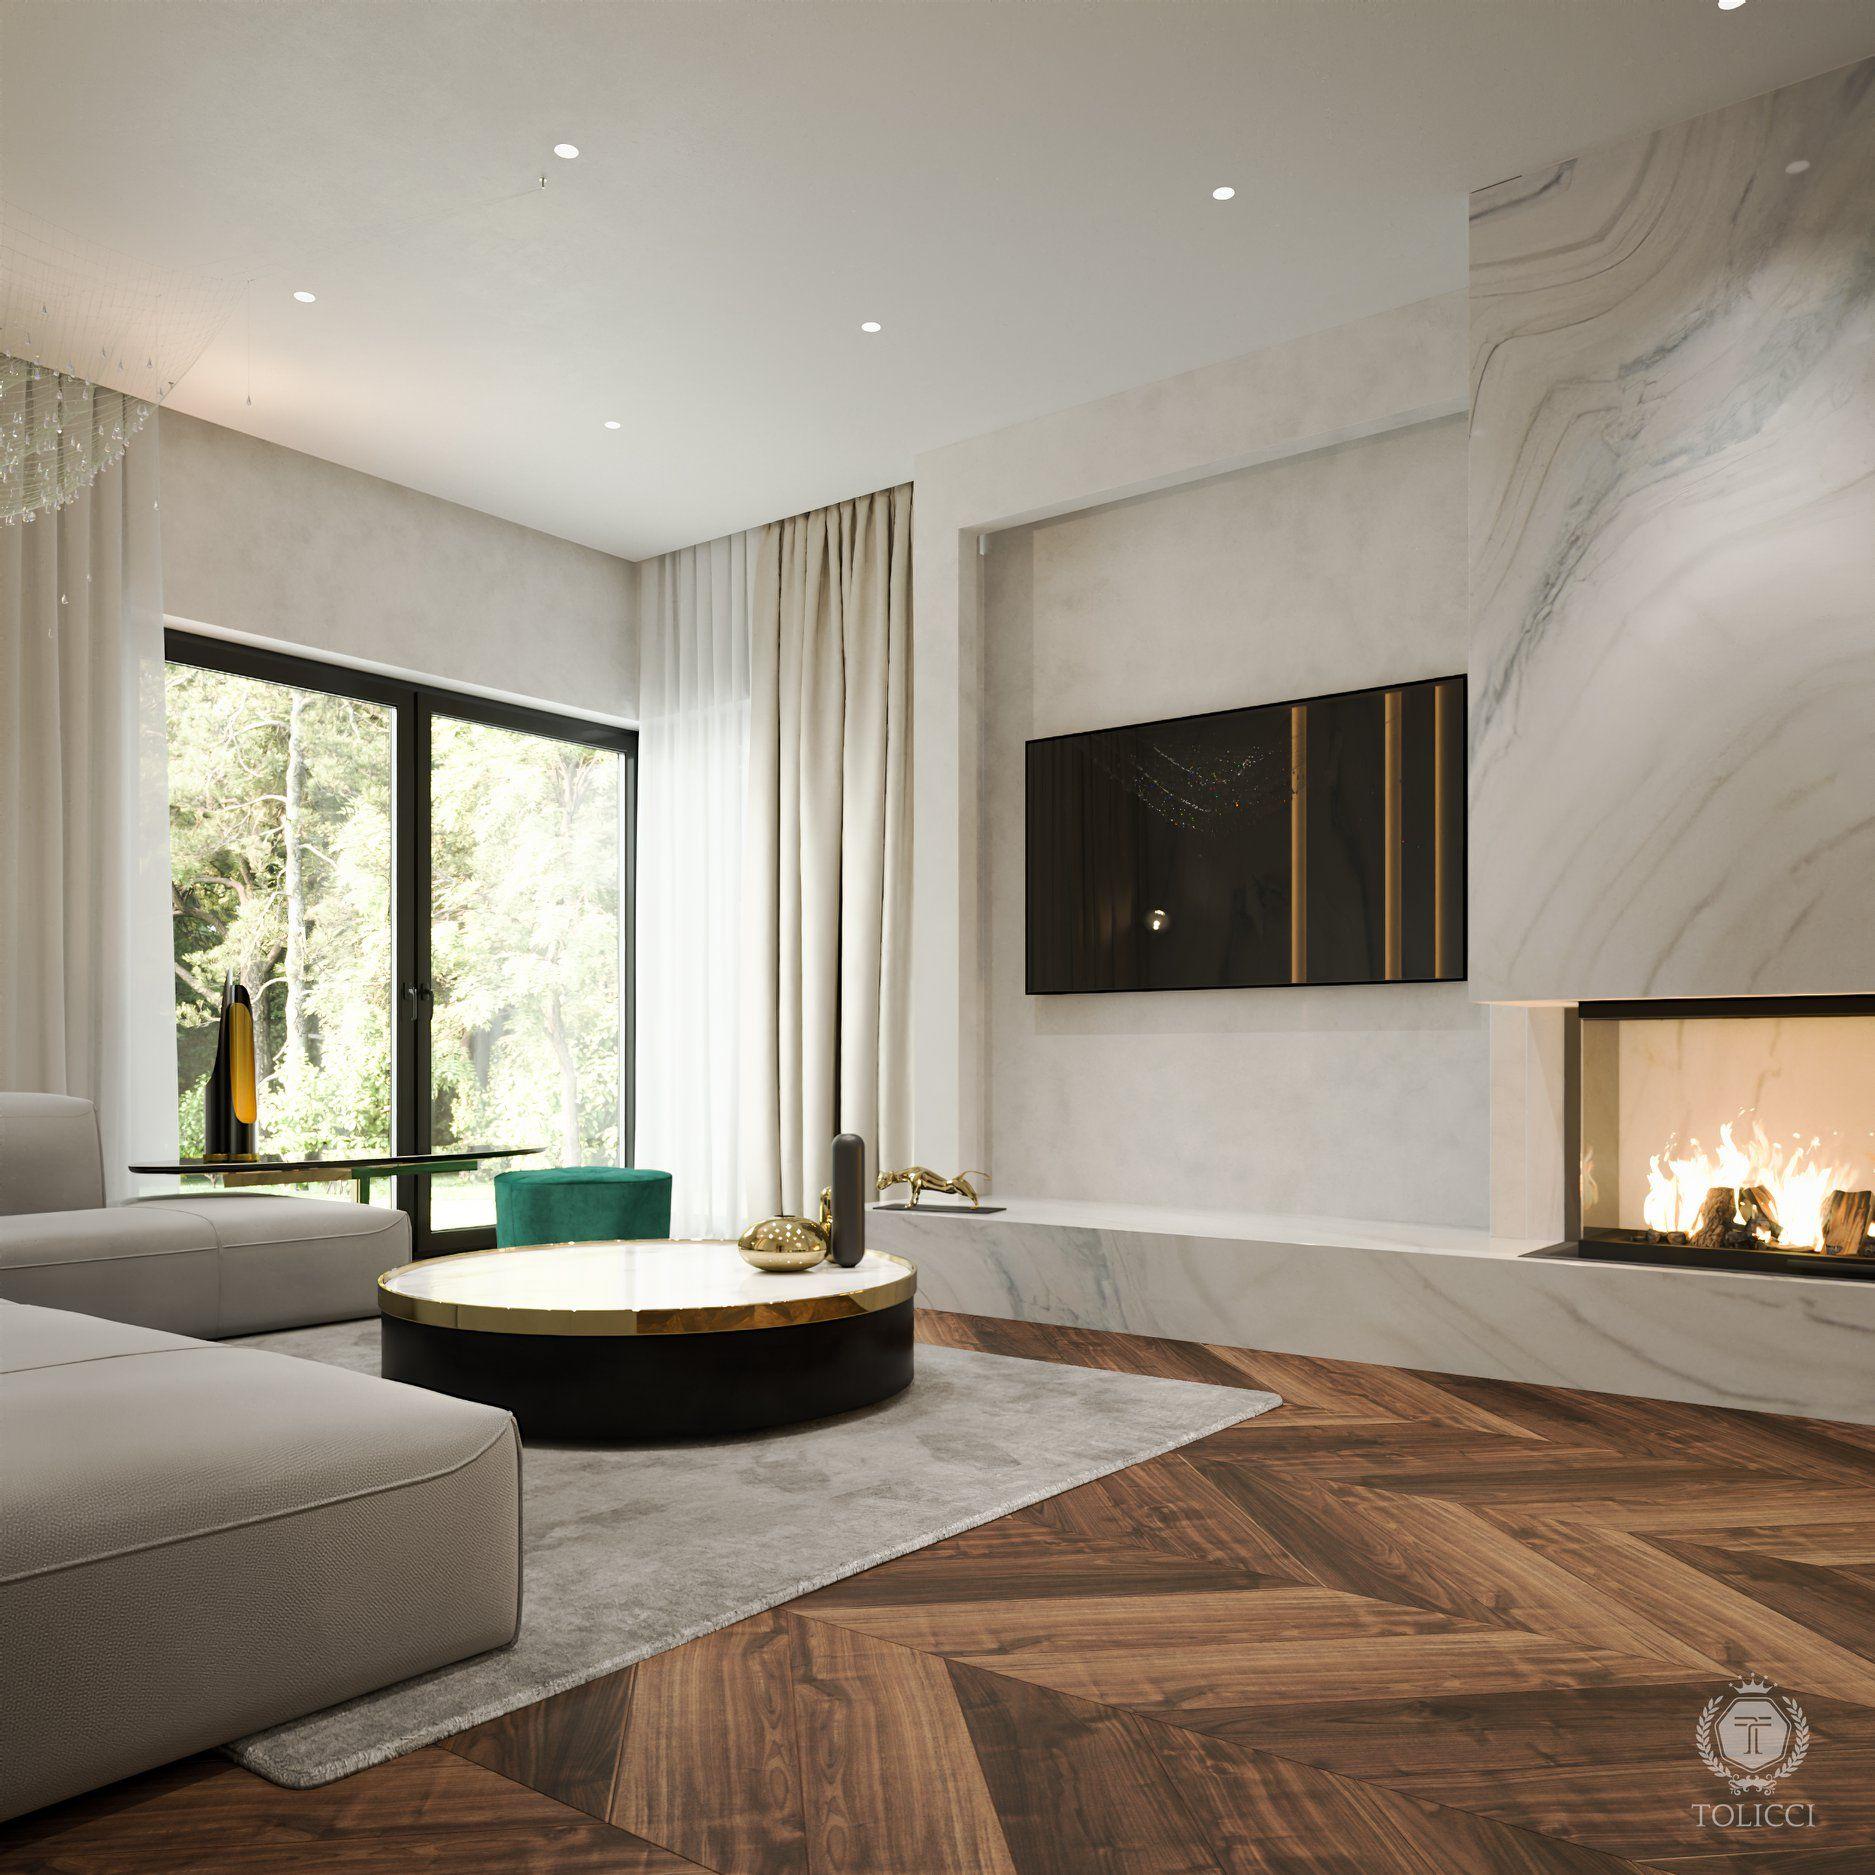 Tolicci, Luxury Modern Living Room, Italian Design